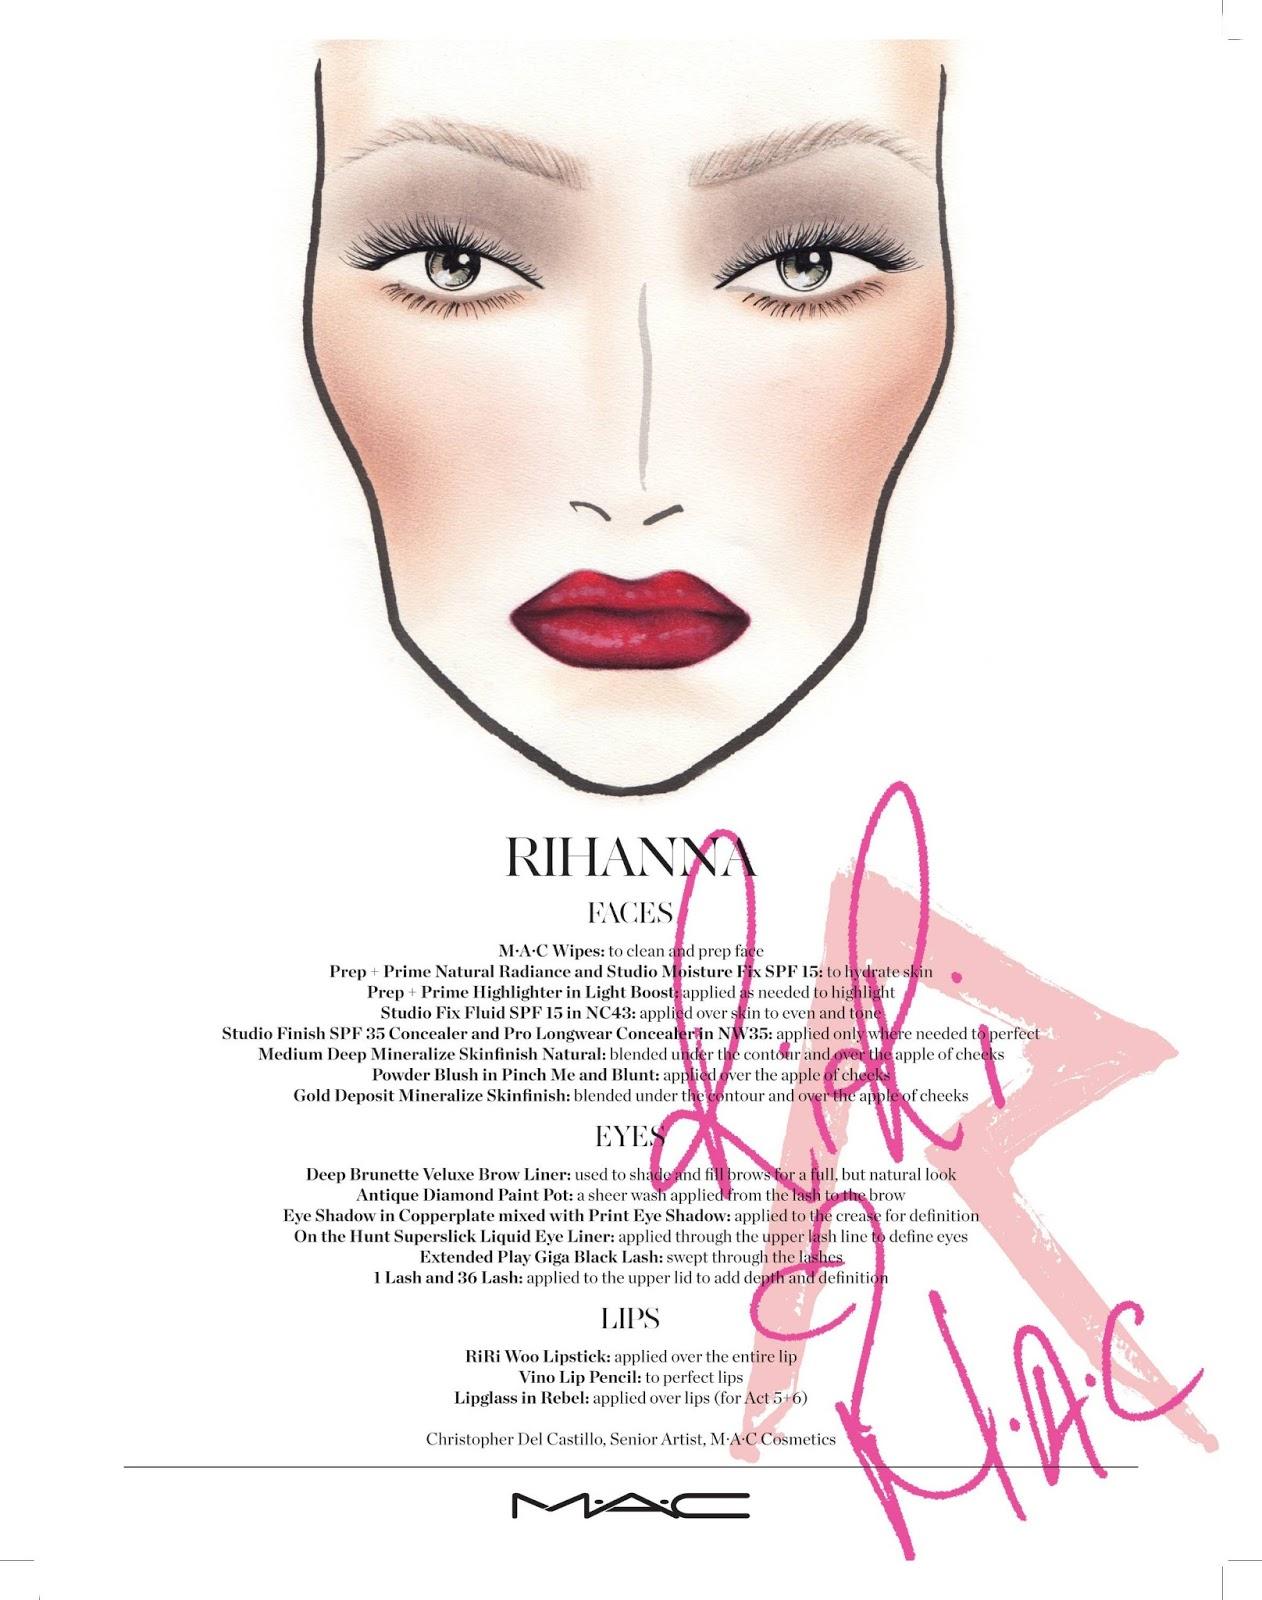 beauty rihanna�s mac riri woo lipstick sells out in